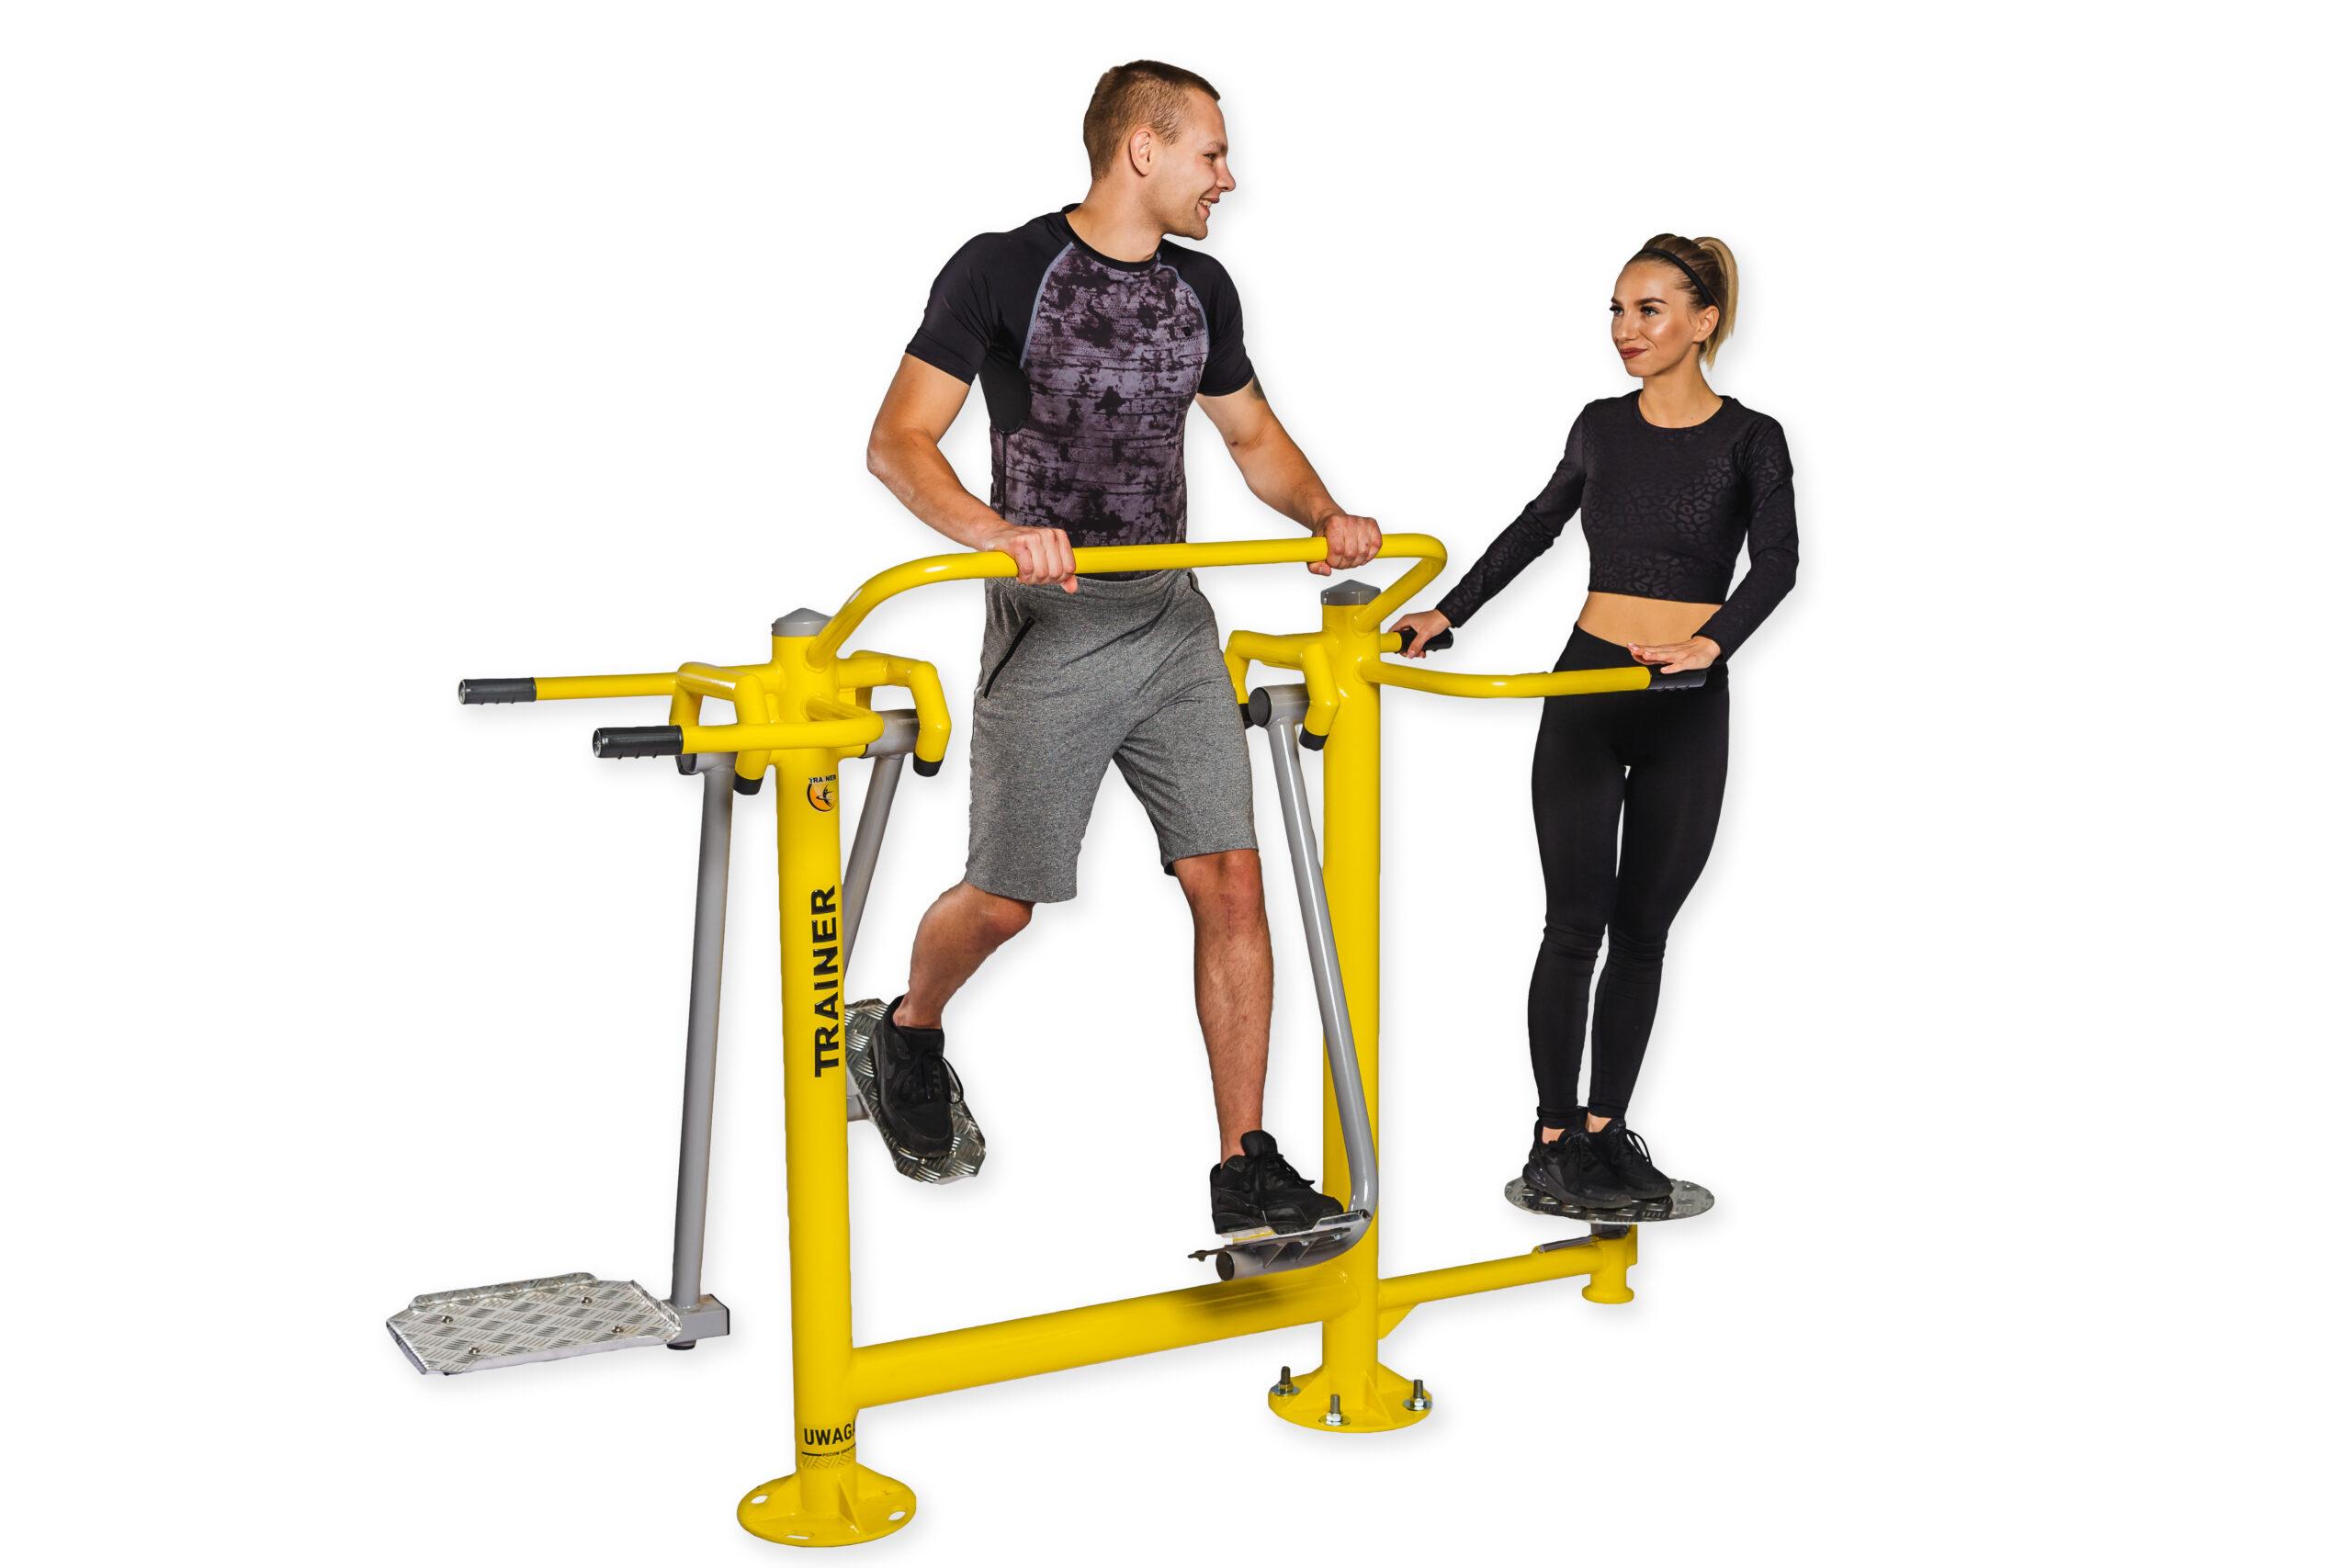 Surfer + Air Walker + Twister Outdoor Gym Equipment